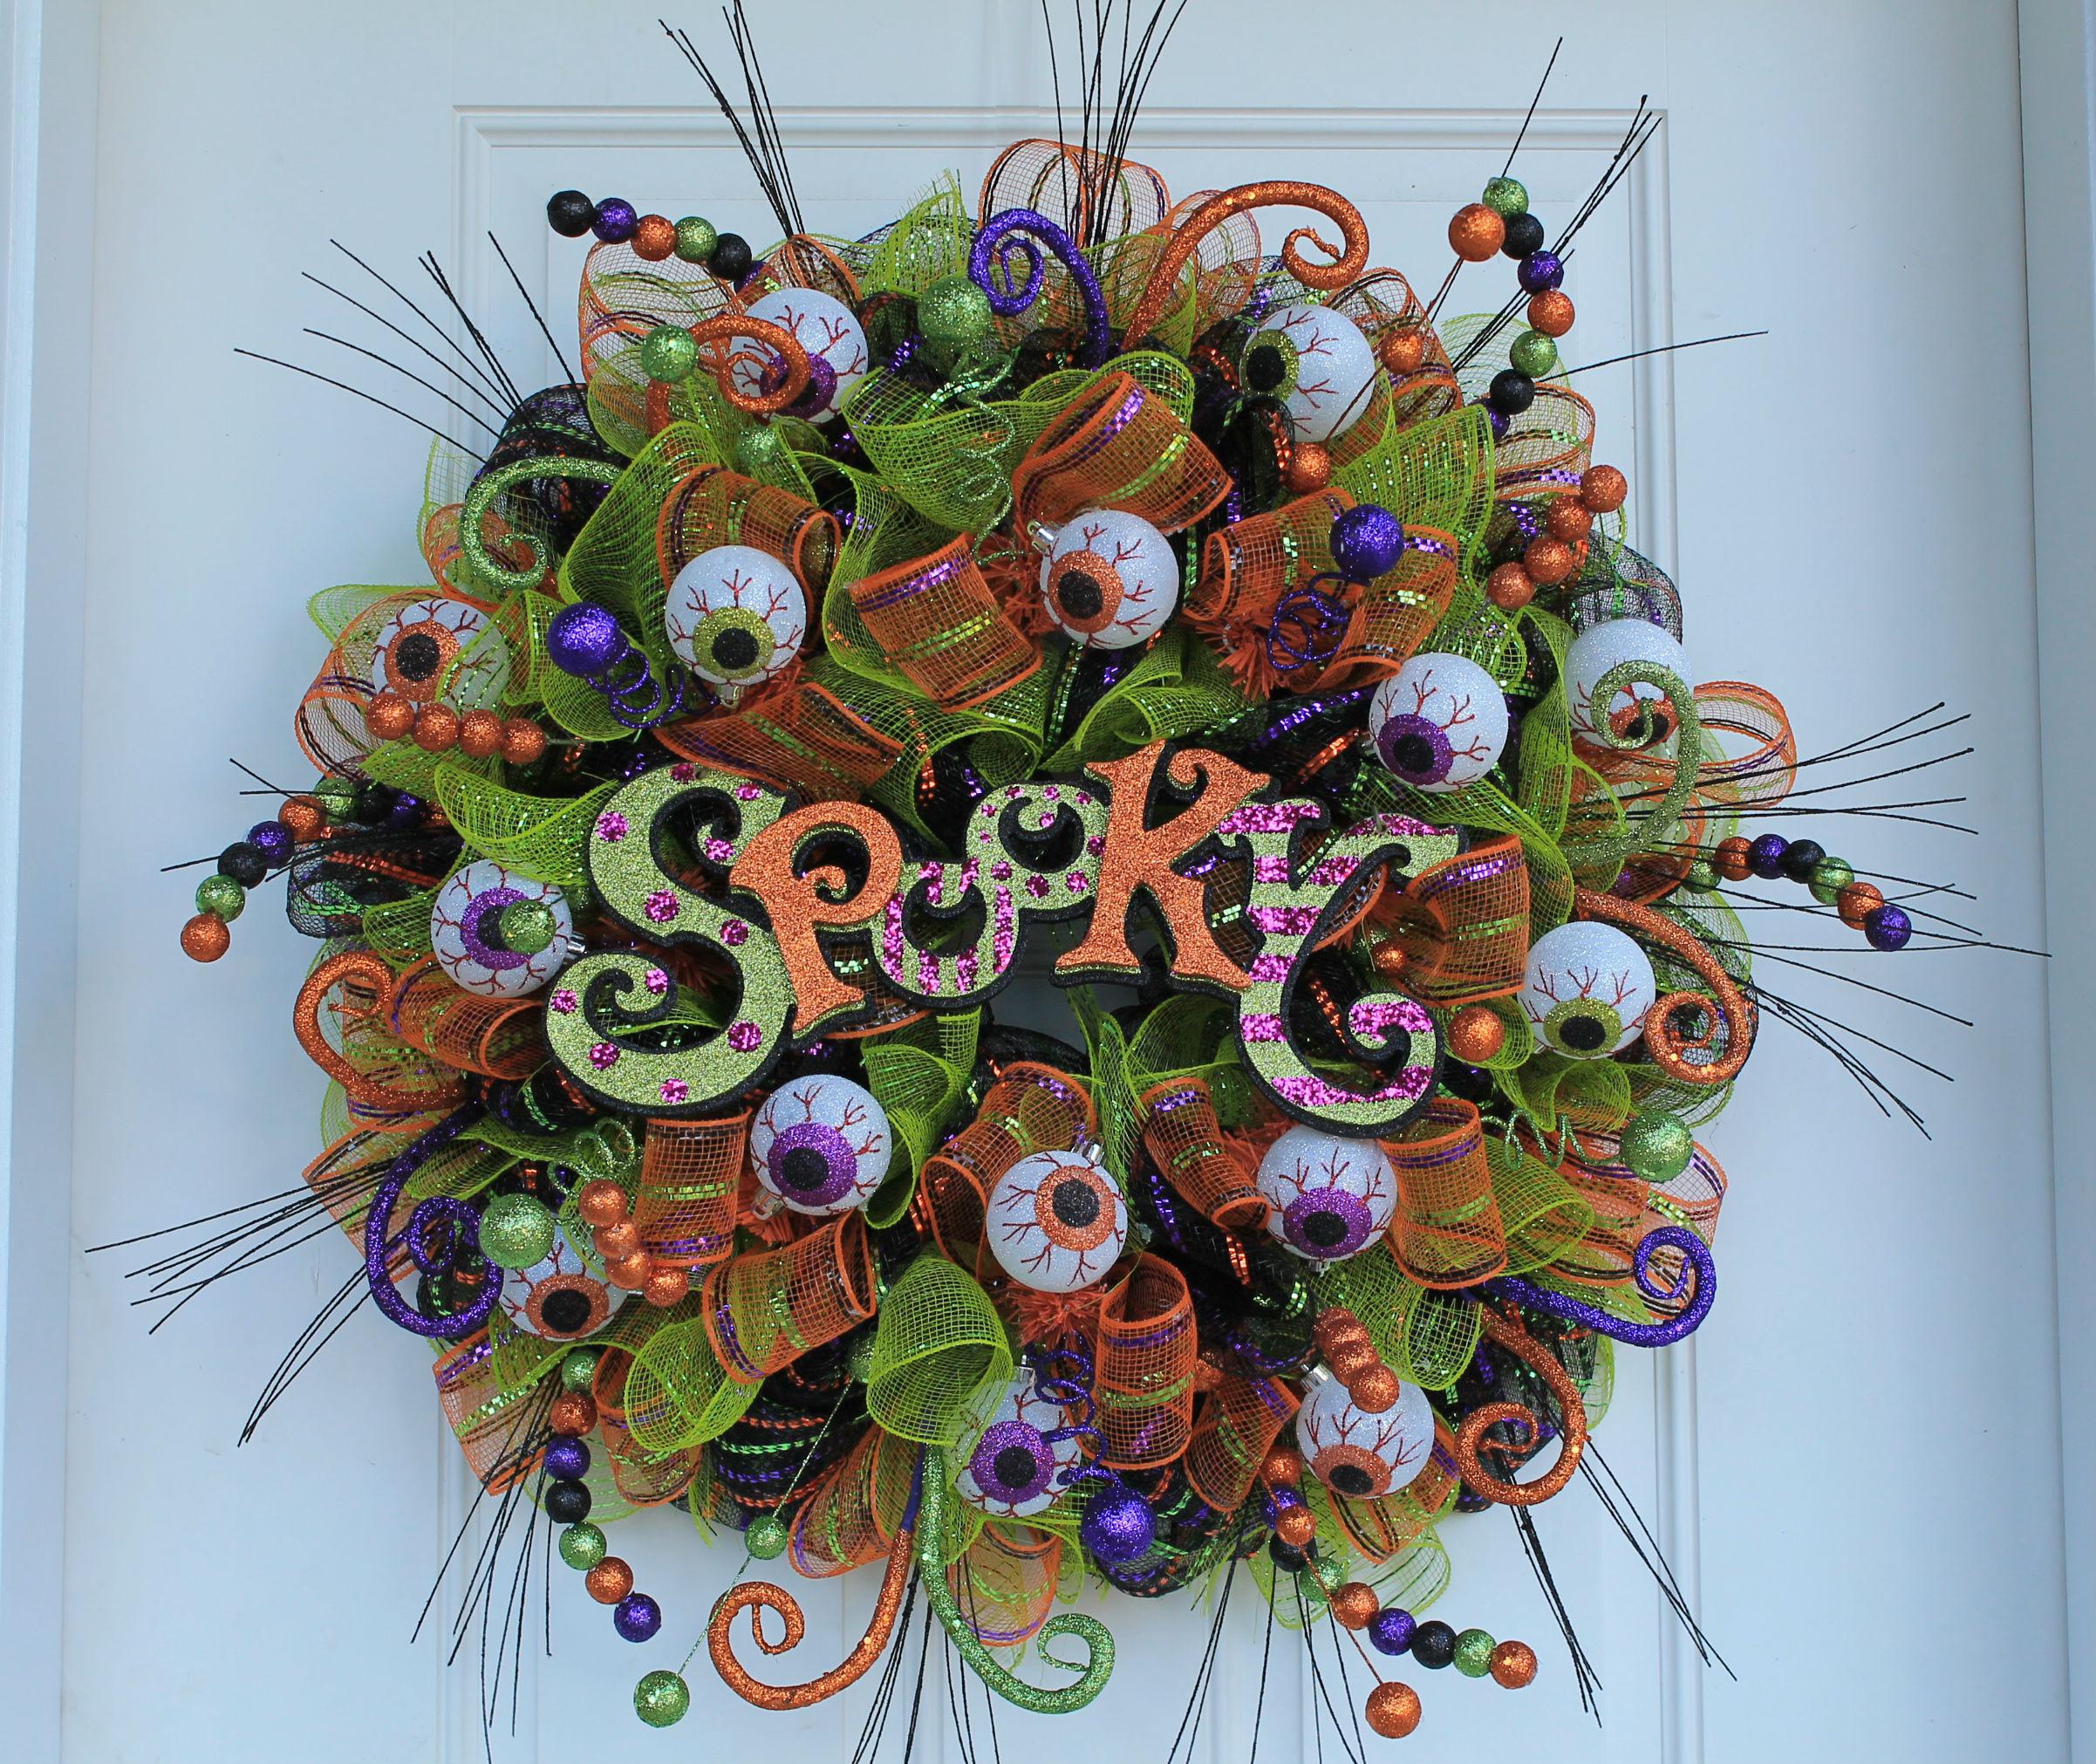 Diy Spooky Mesh Halloween Wreath The Wreath Depot